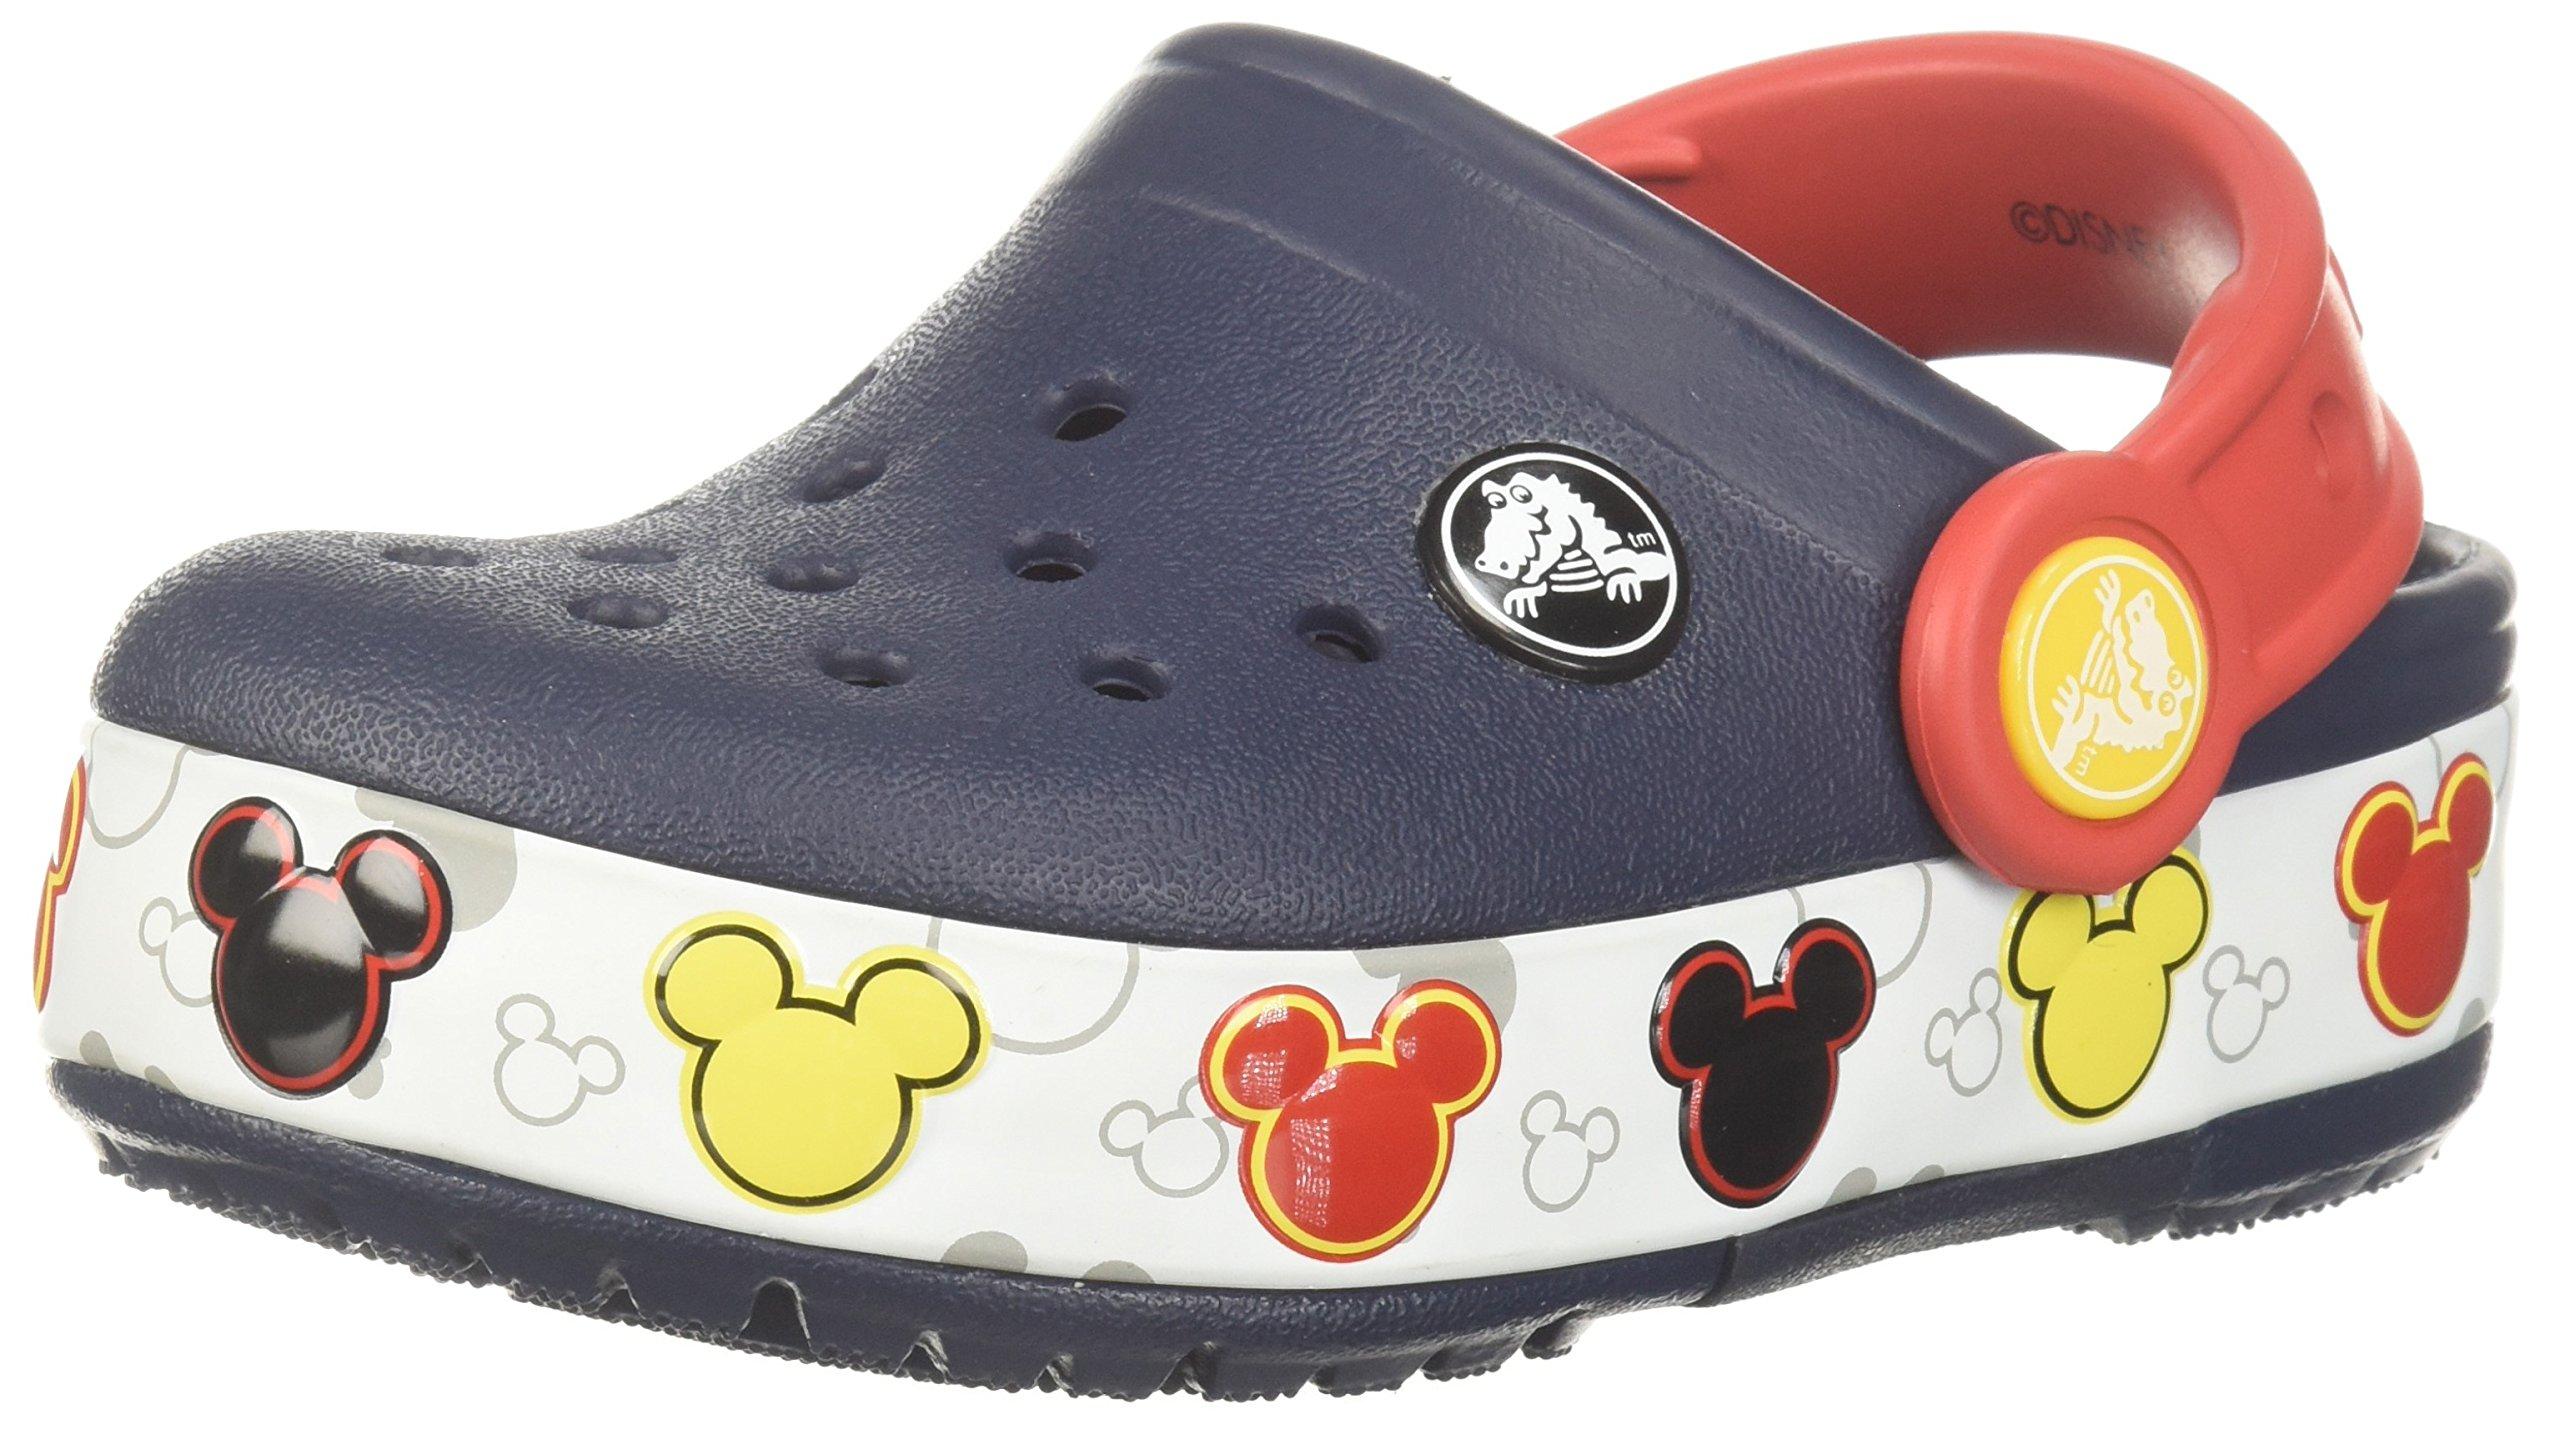 81986cb36 Get Quotations · Crocs Kids  Crocband Fun Lab Mickey Light-up Clog